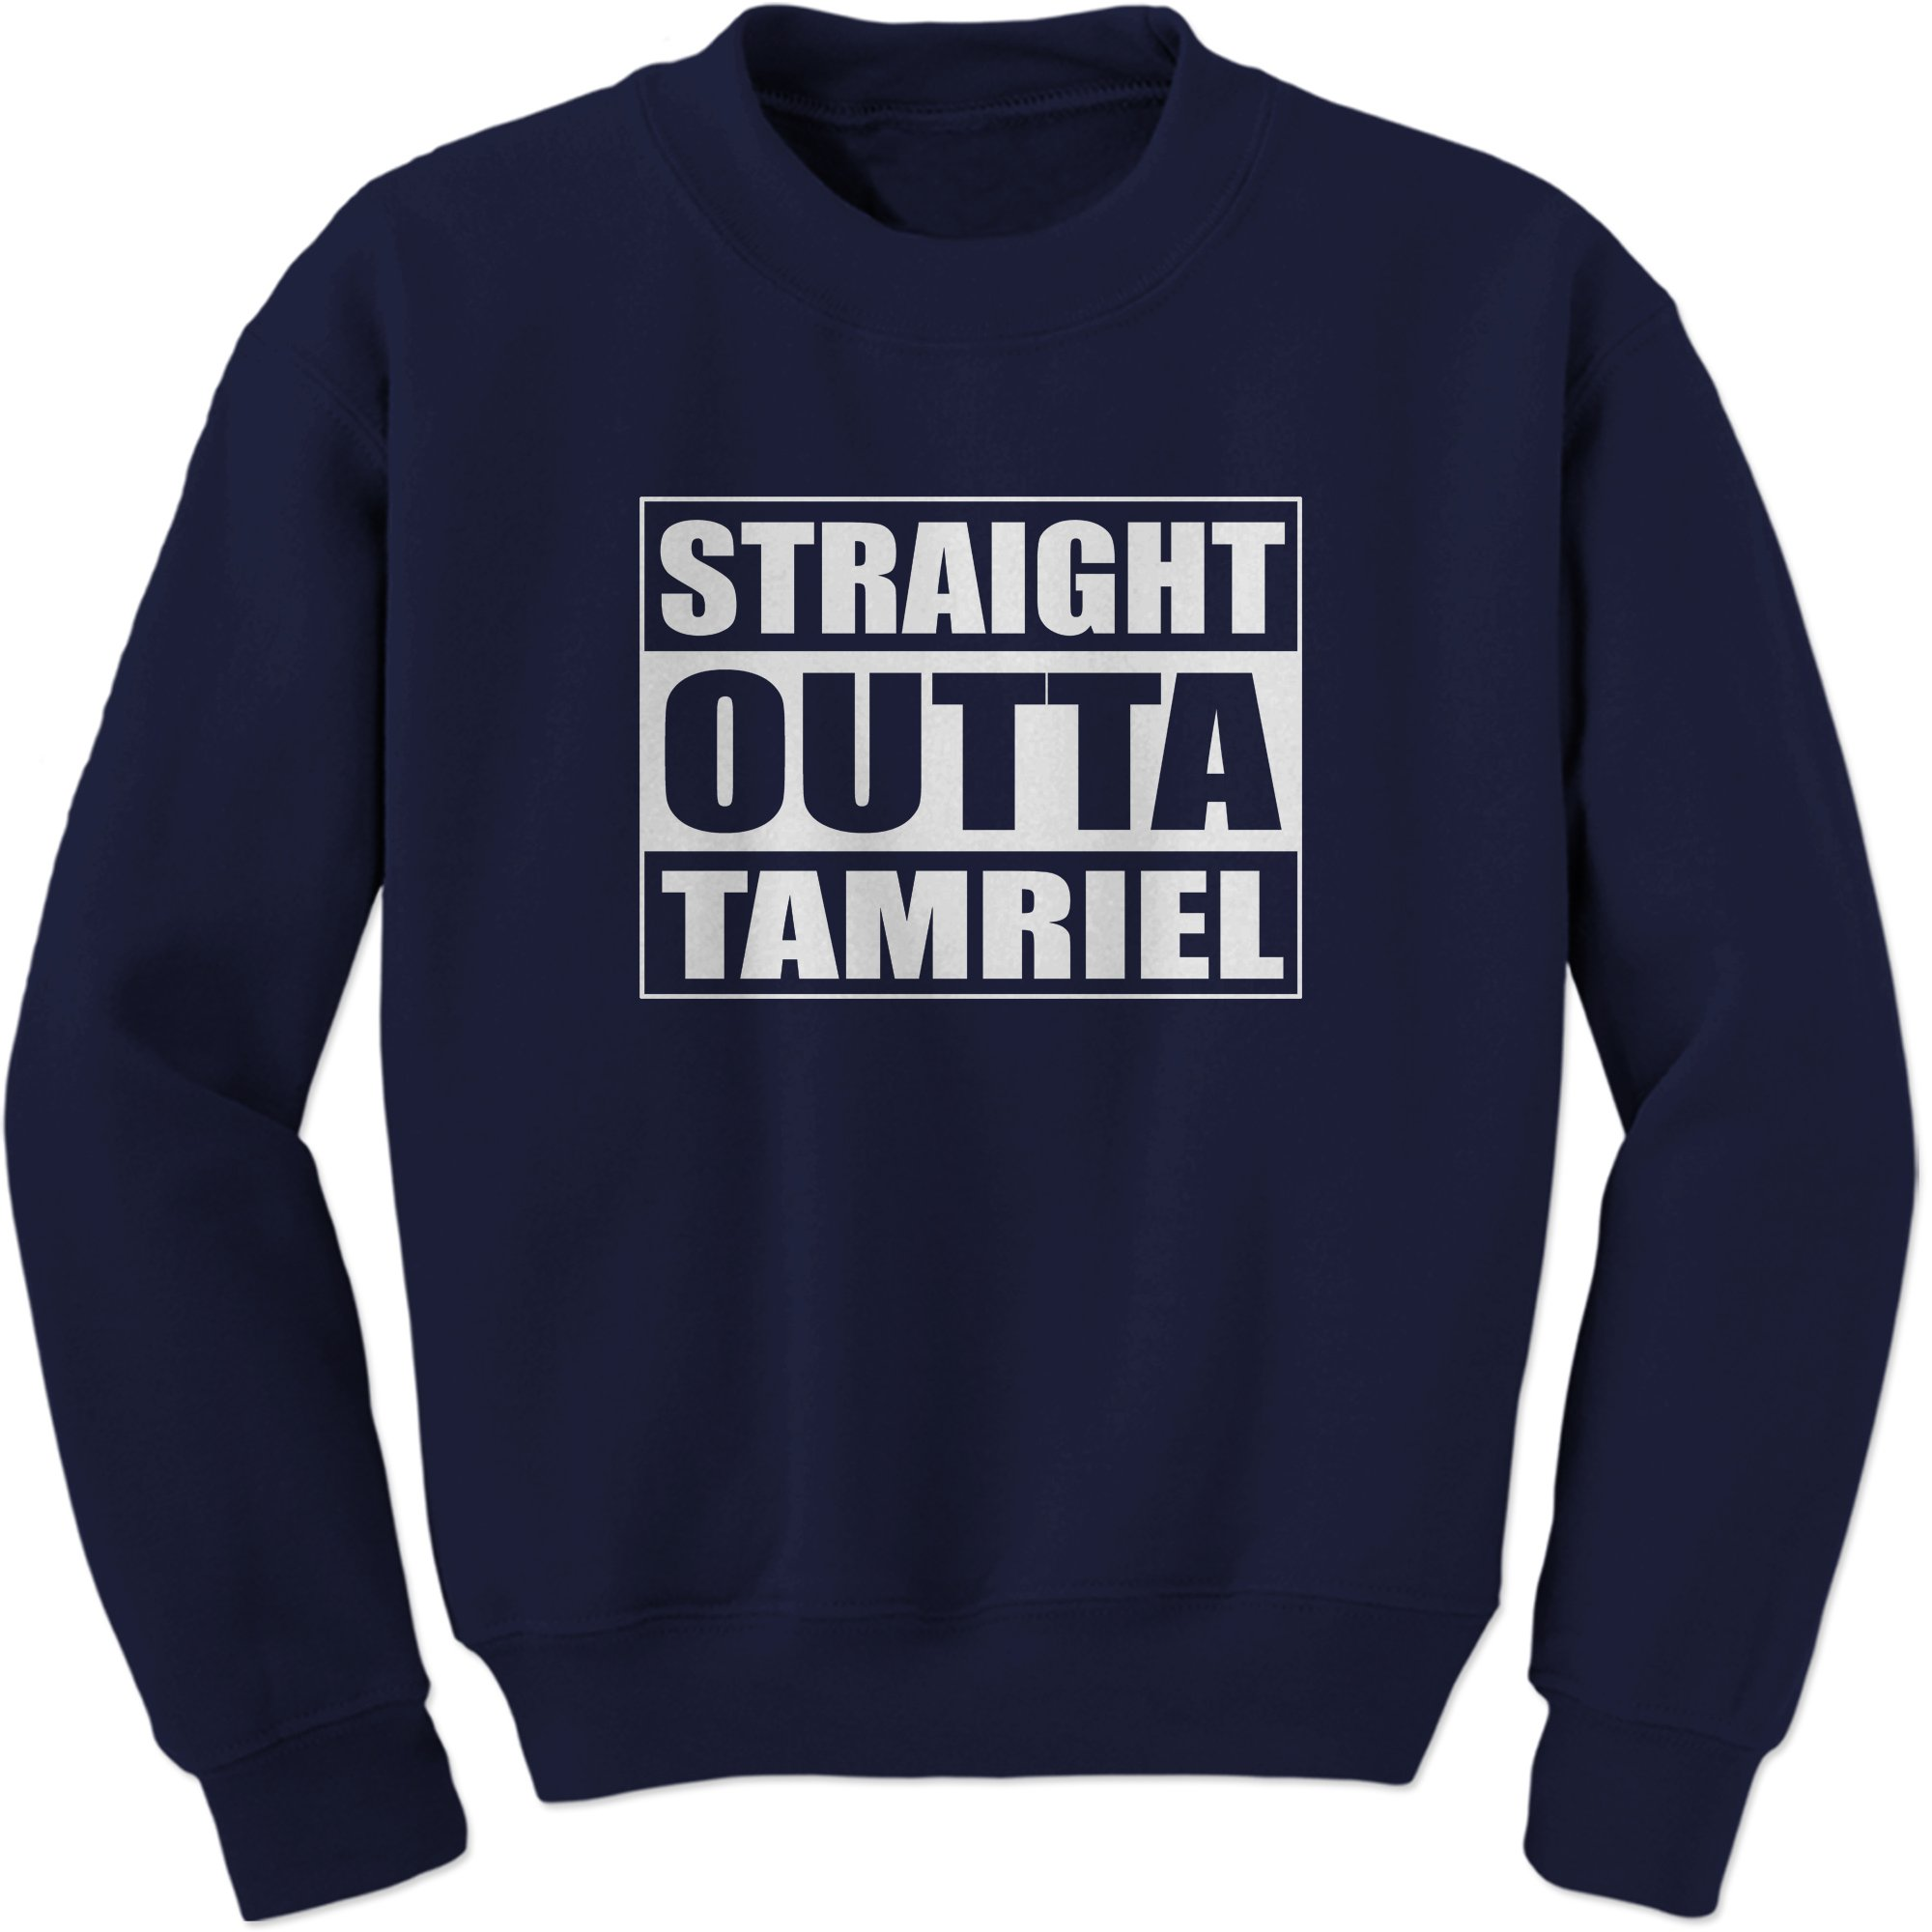 Straight Outta Tamriel Gamer Crewneck 9601 Shirts